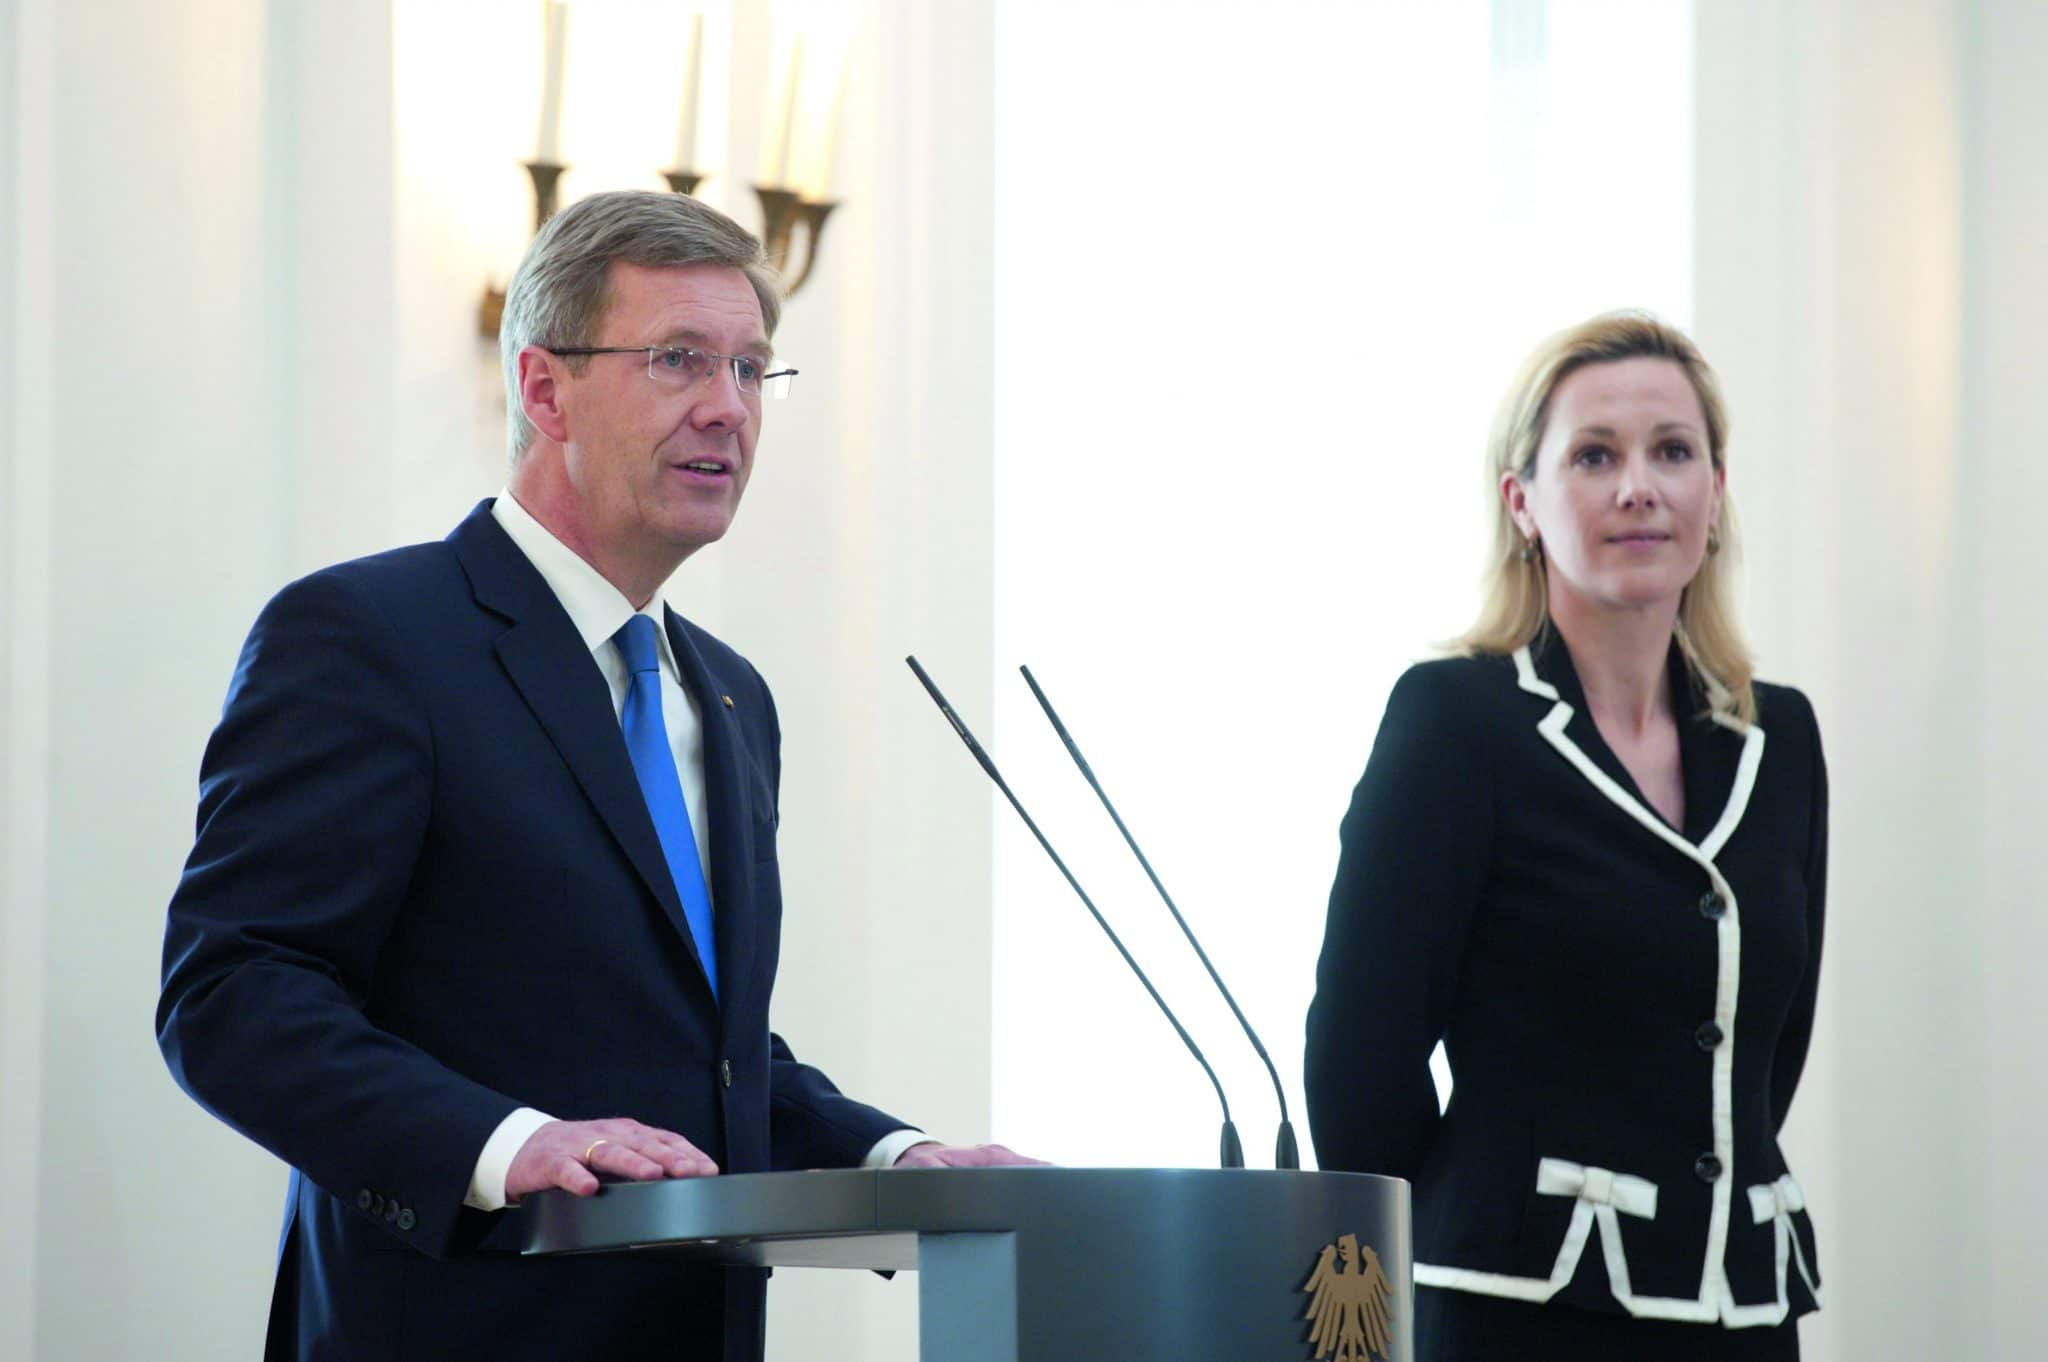 Christian Wulff am Tag seines Rücktritts, Foto: Marco Urban